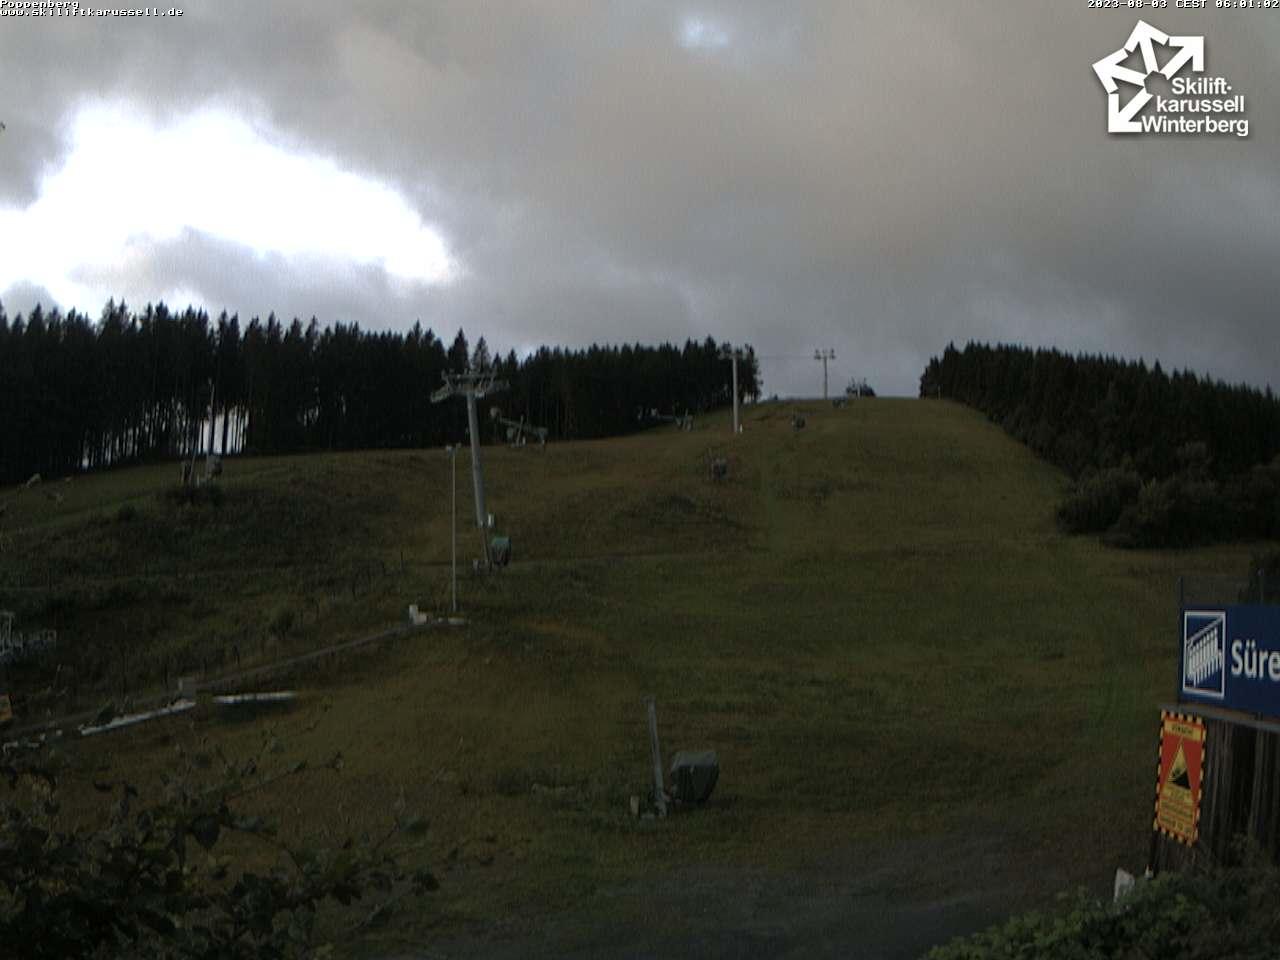 Skiliftkarussell Poppenberg Winterberg Webcam